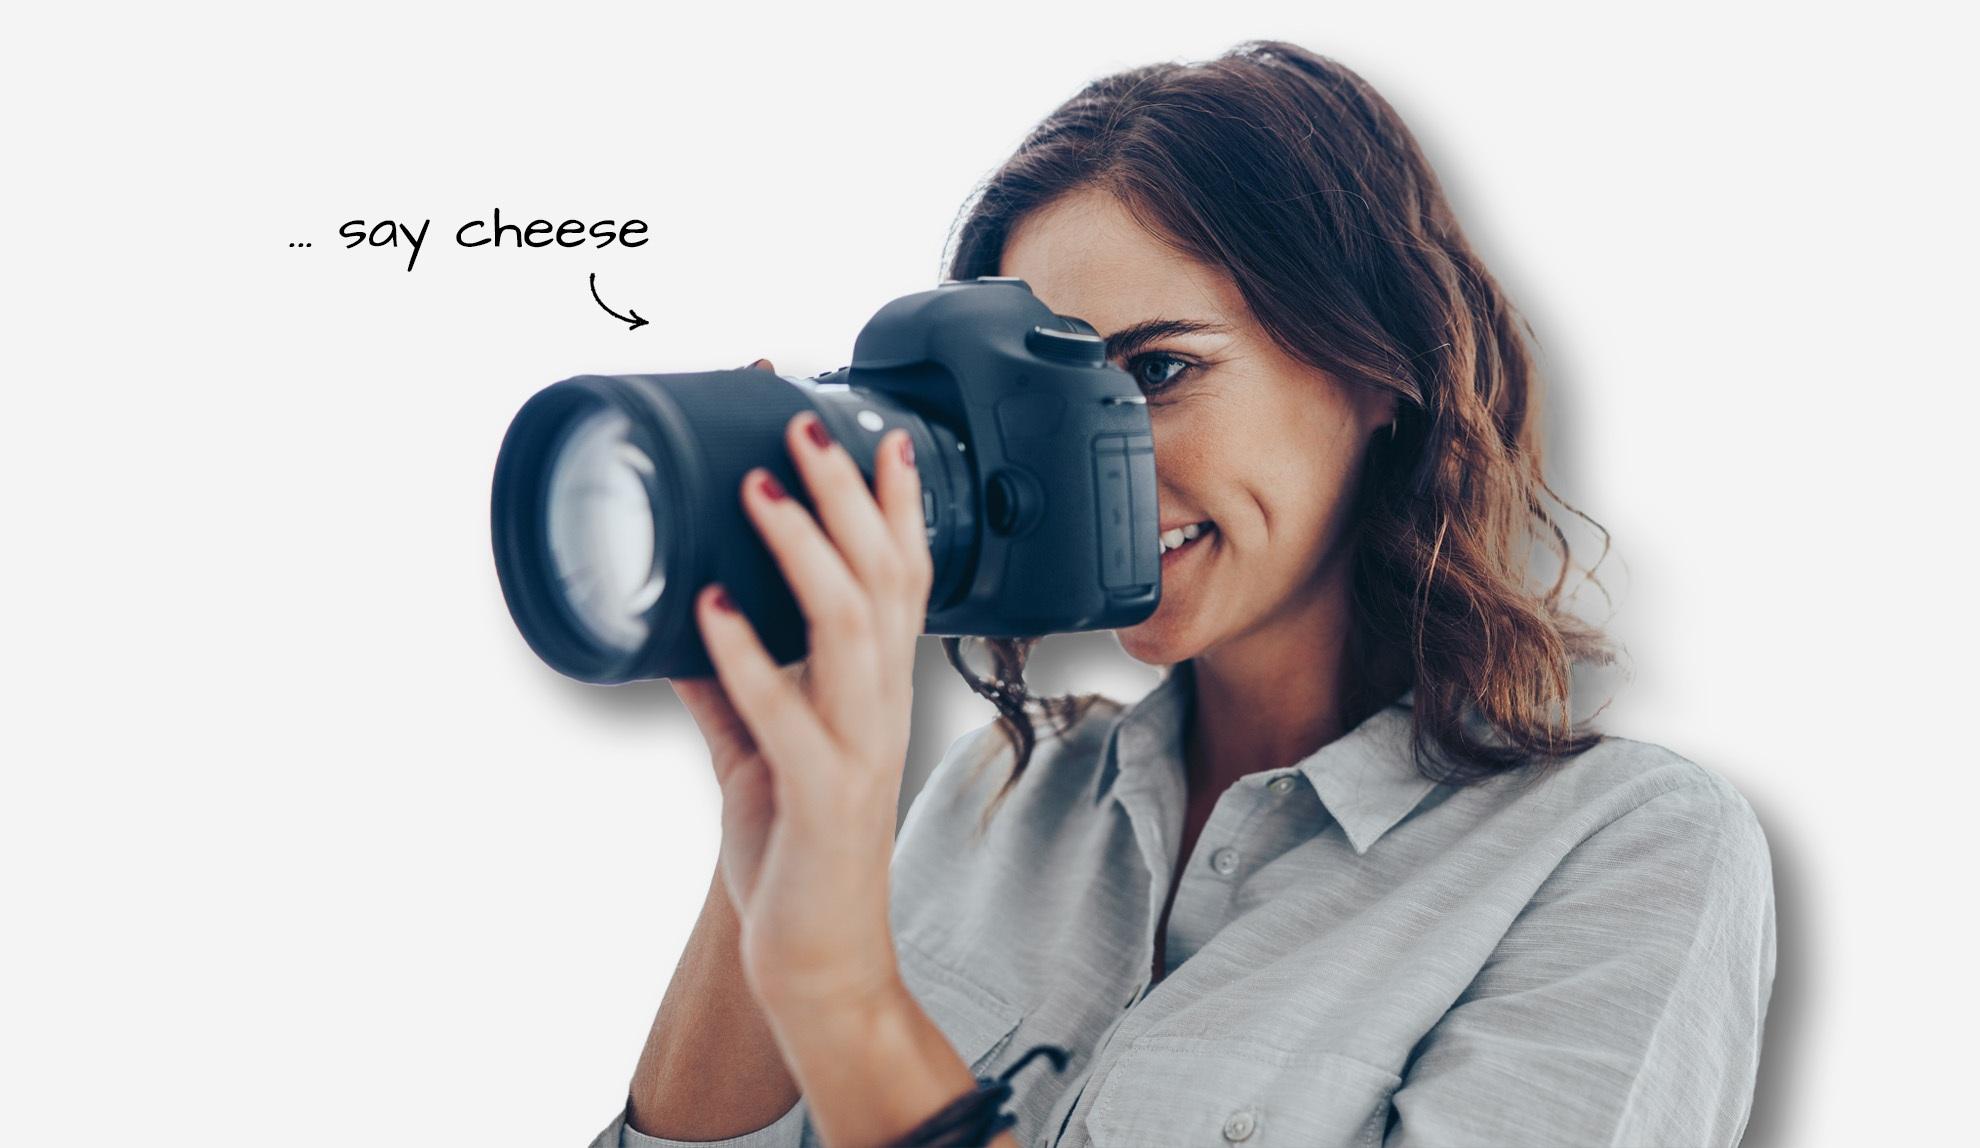 Businessfotografie - Header Fotografin